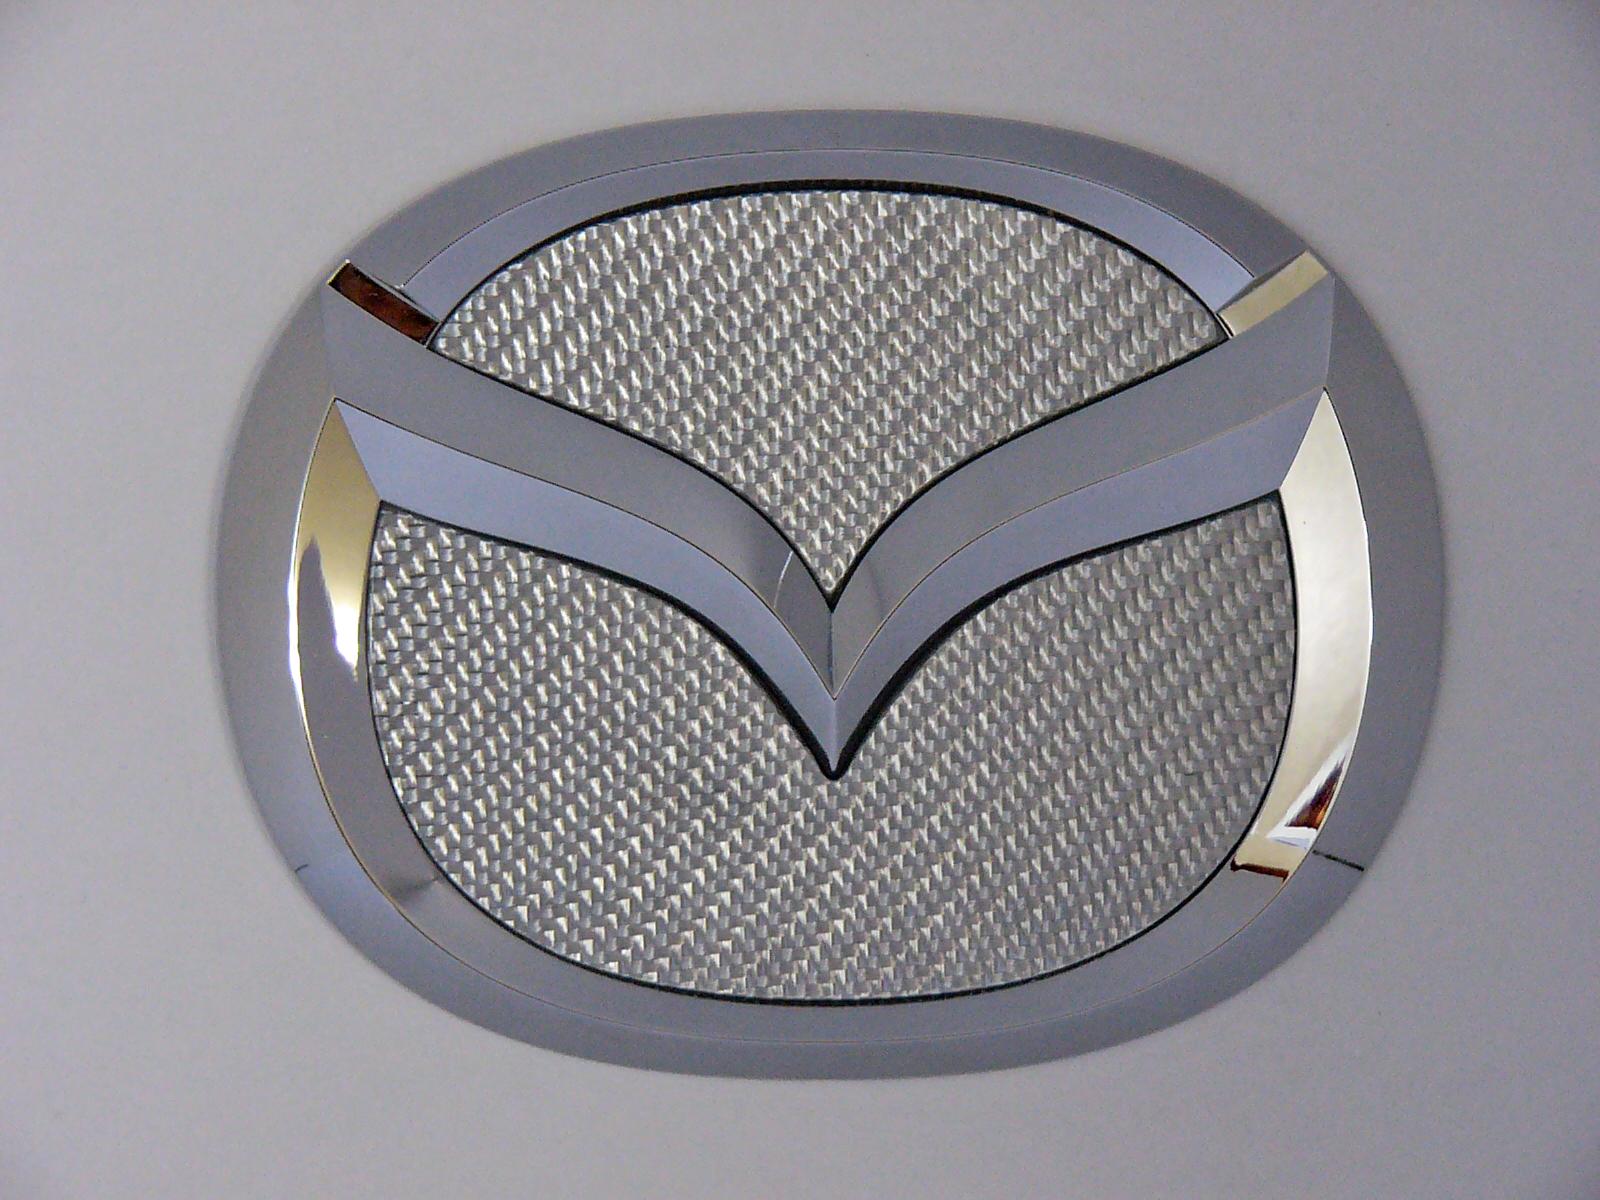 MAZDA CX7・MPV・プレマシー専用リヤエンブレムシルバーカーボンフィニッシャー